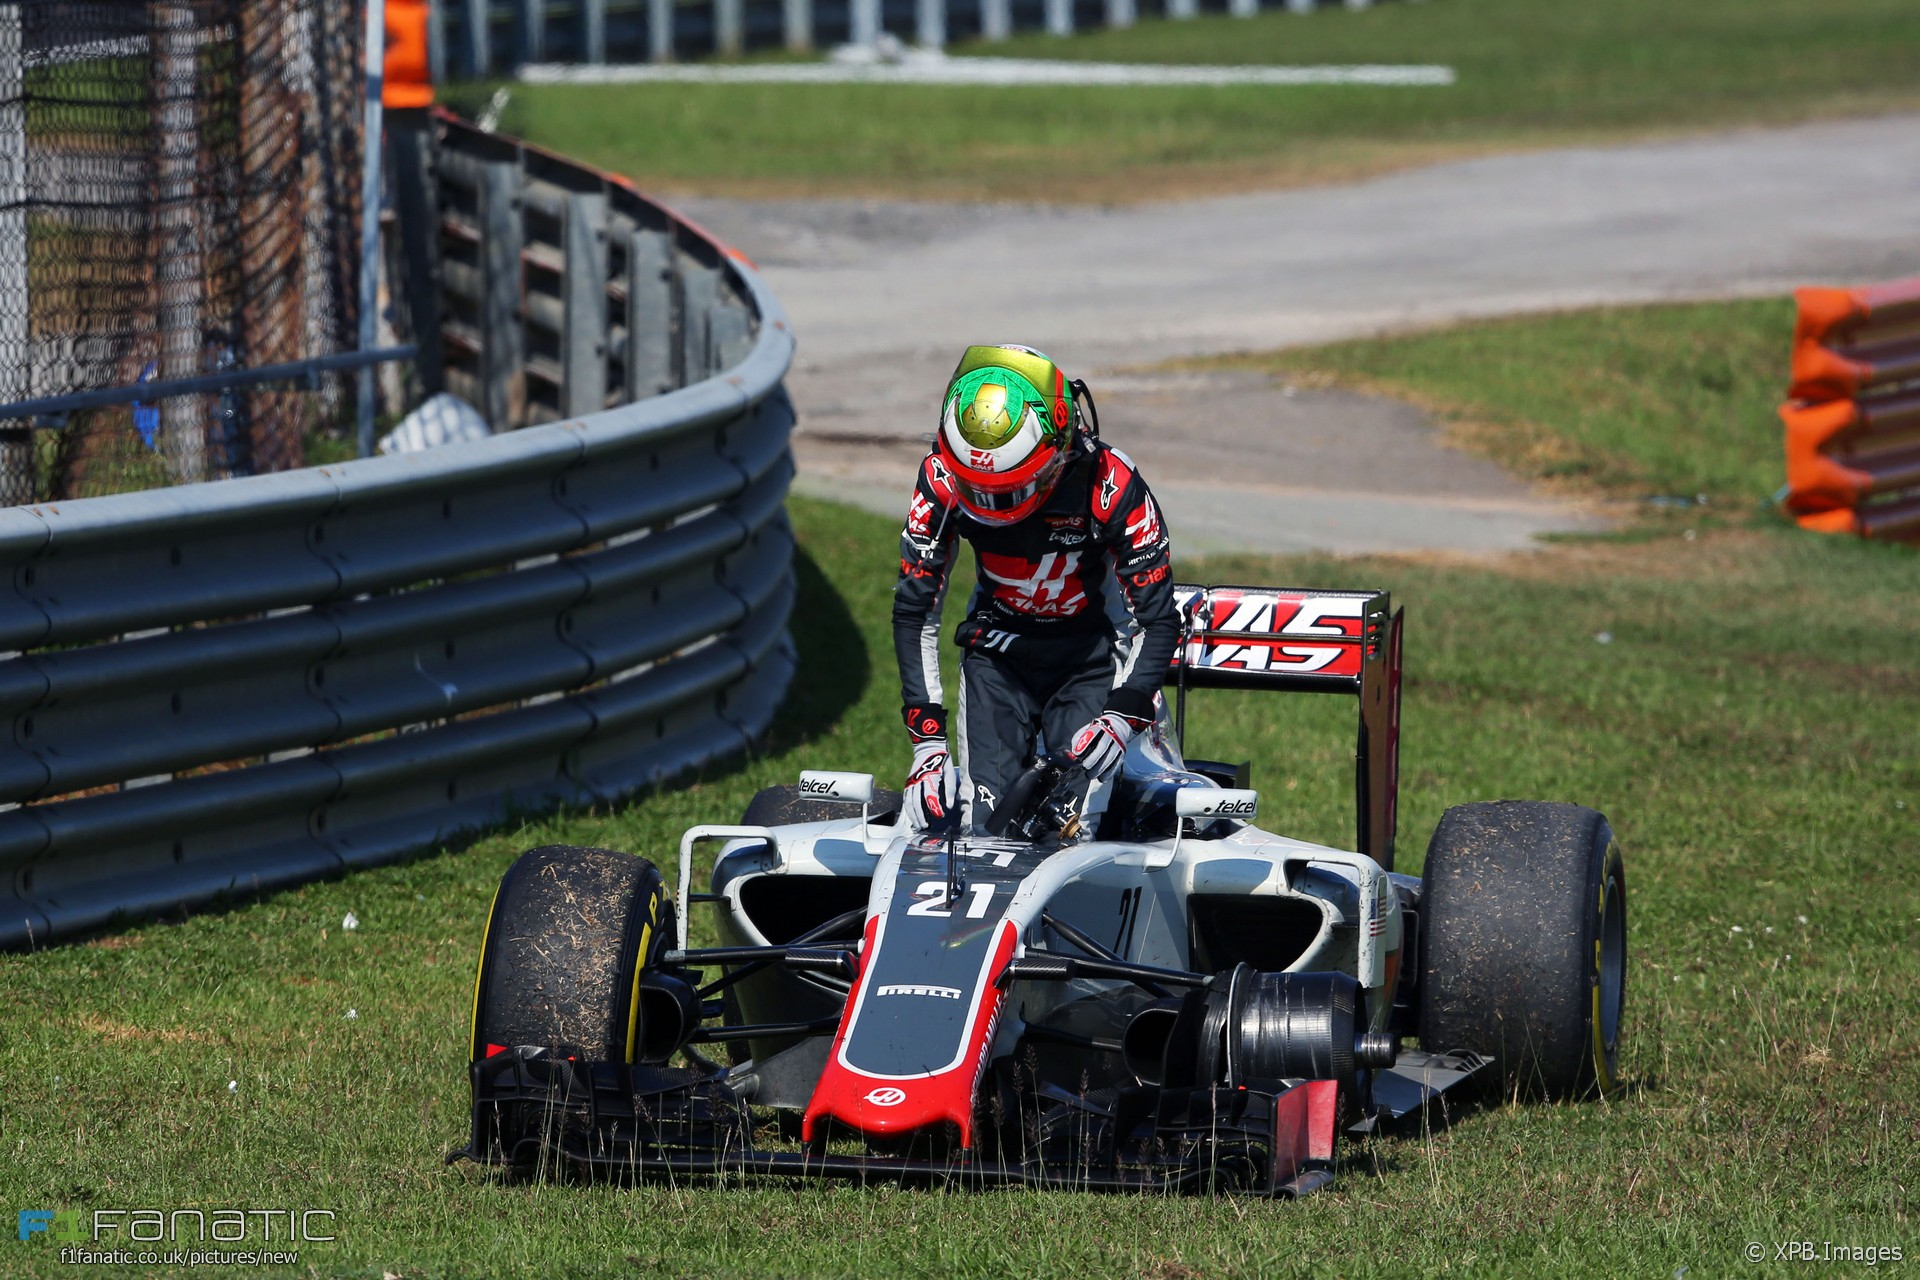 Esteban Gutierrez, Haas, Sepang International Circuit, 2016